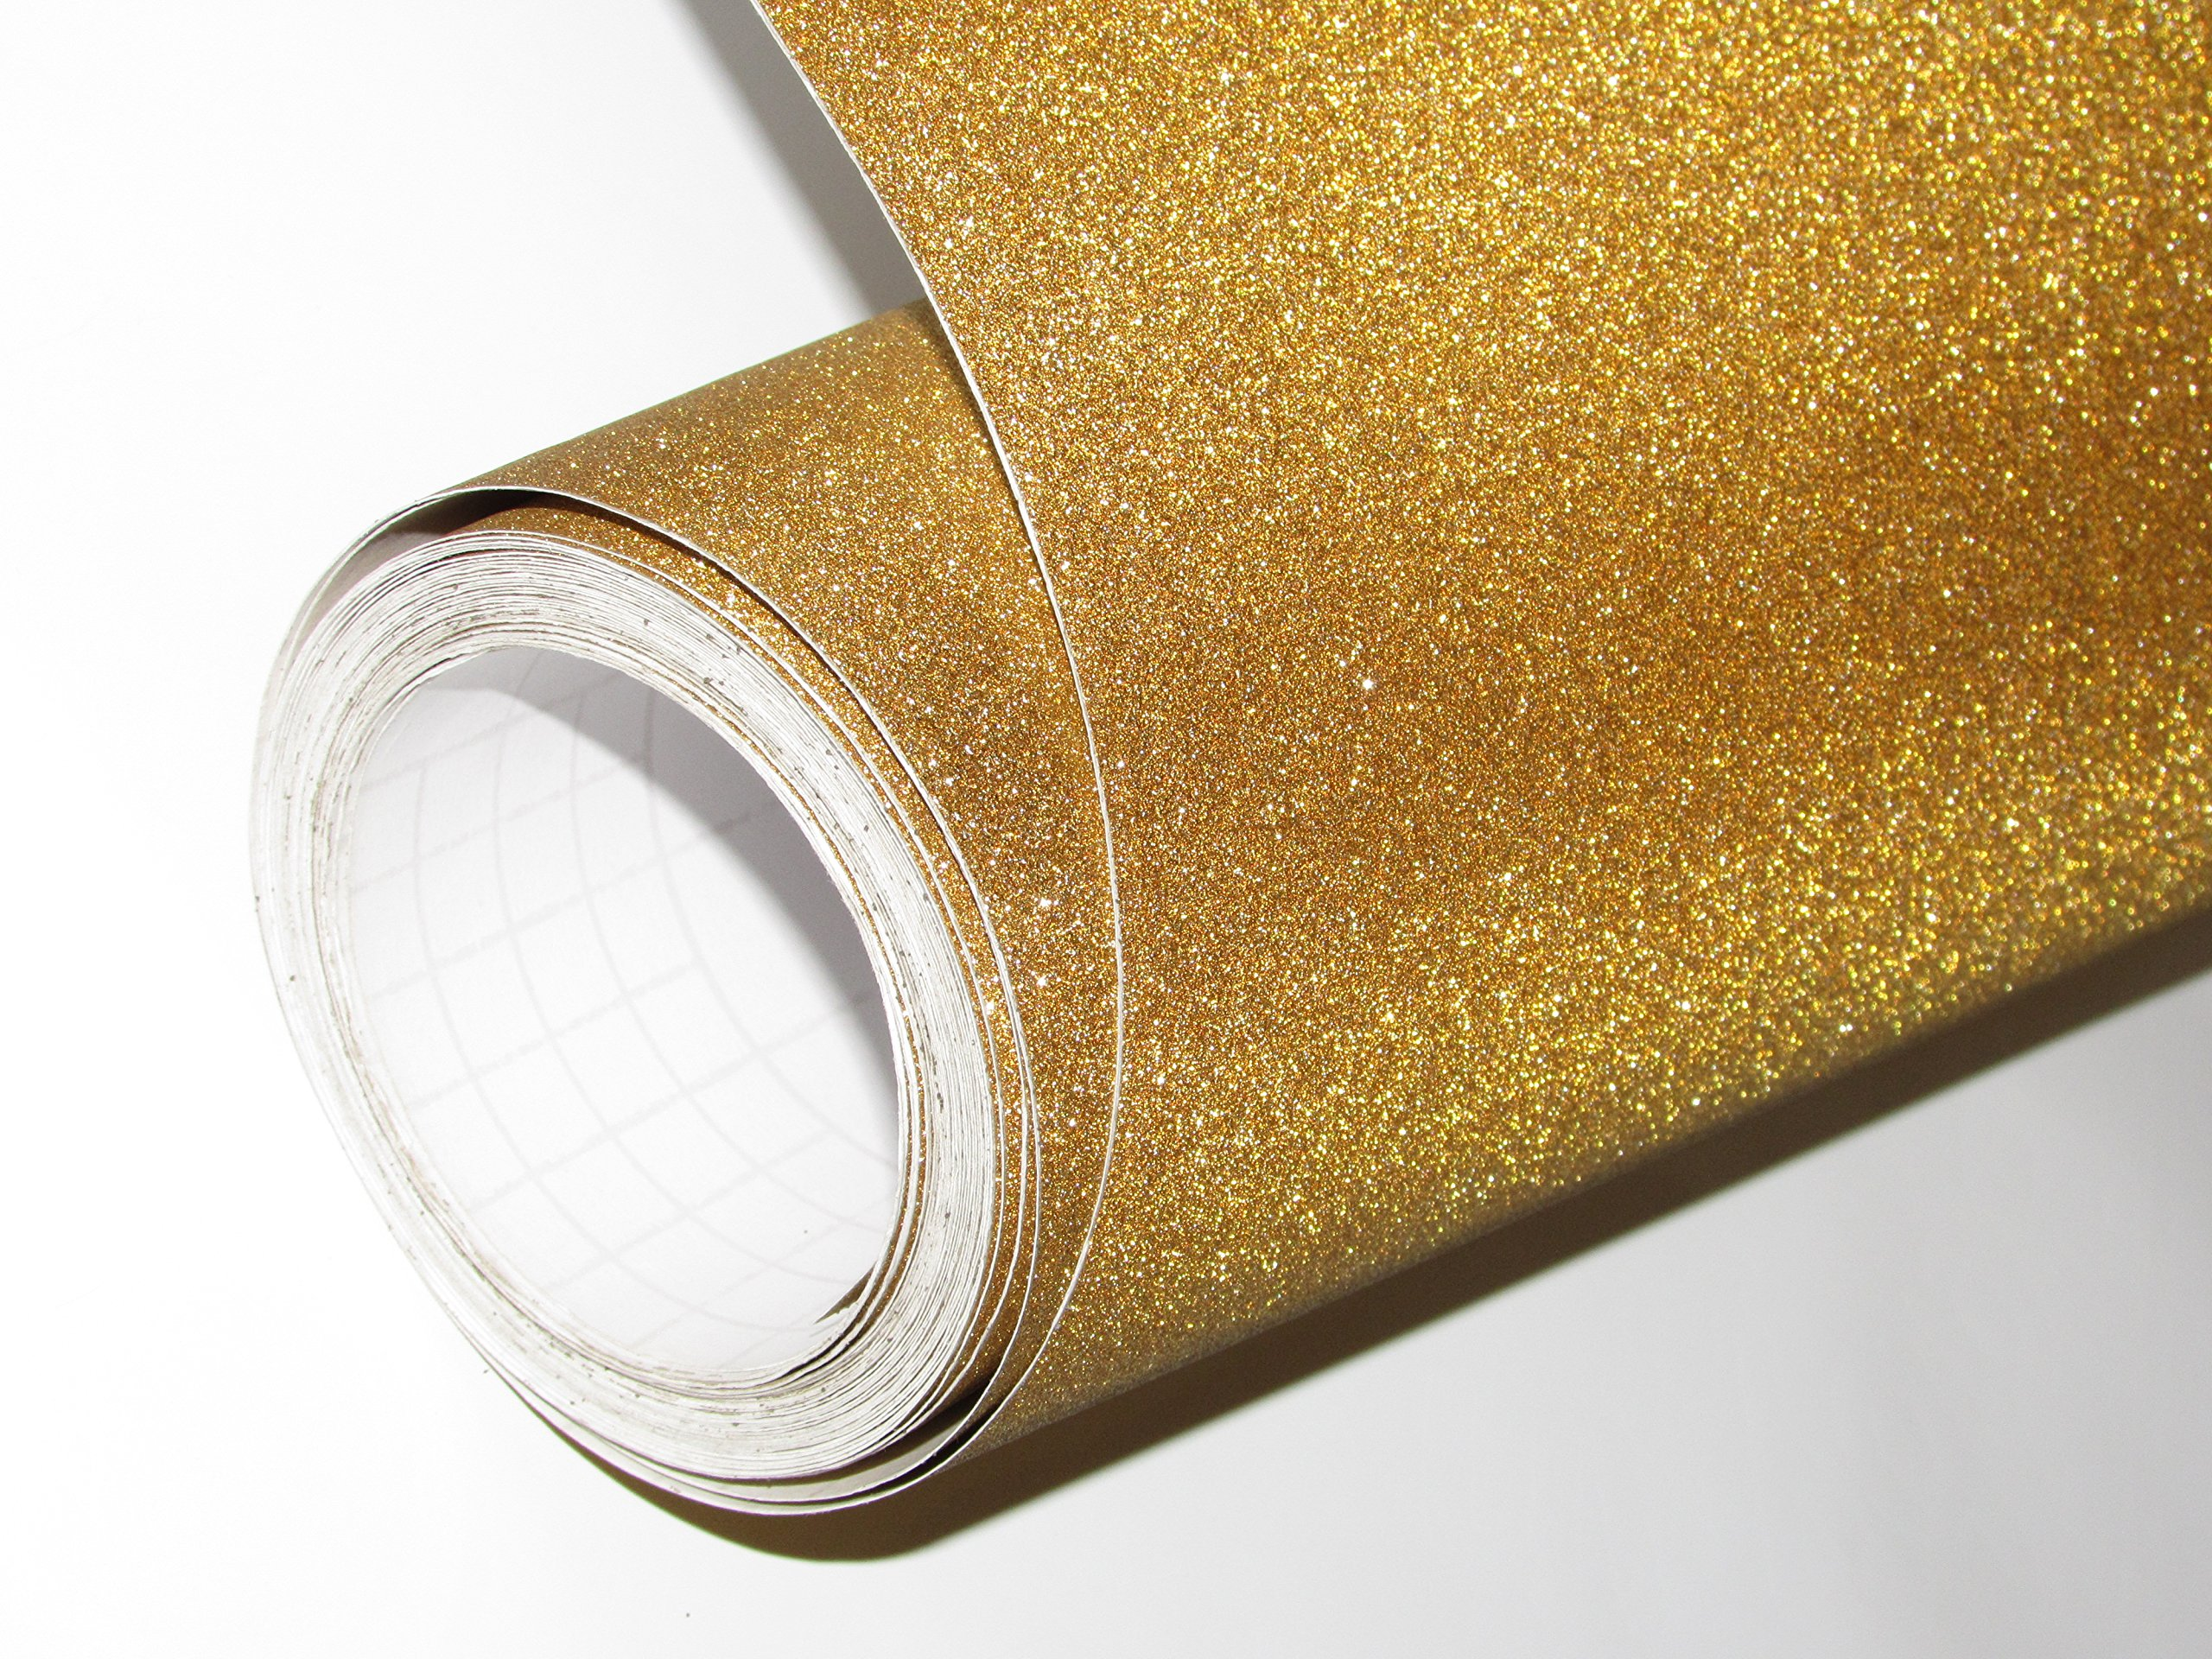 CVANU Glitter Self Adhesive Shelf Liner Film Vinyl Peel-Stick Multipurpose Roll, 12X36-inches (Golden) product image